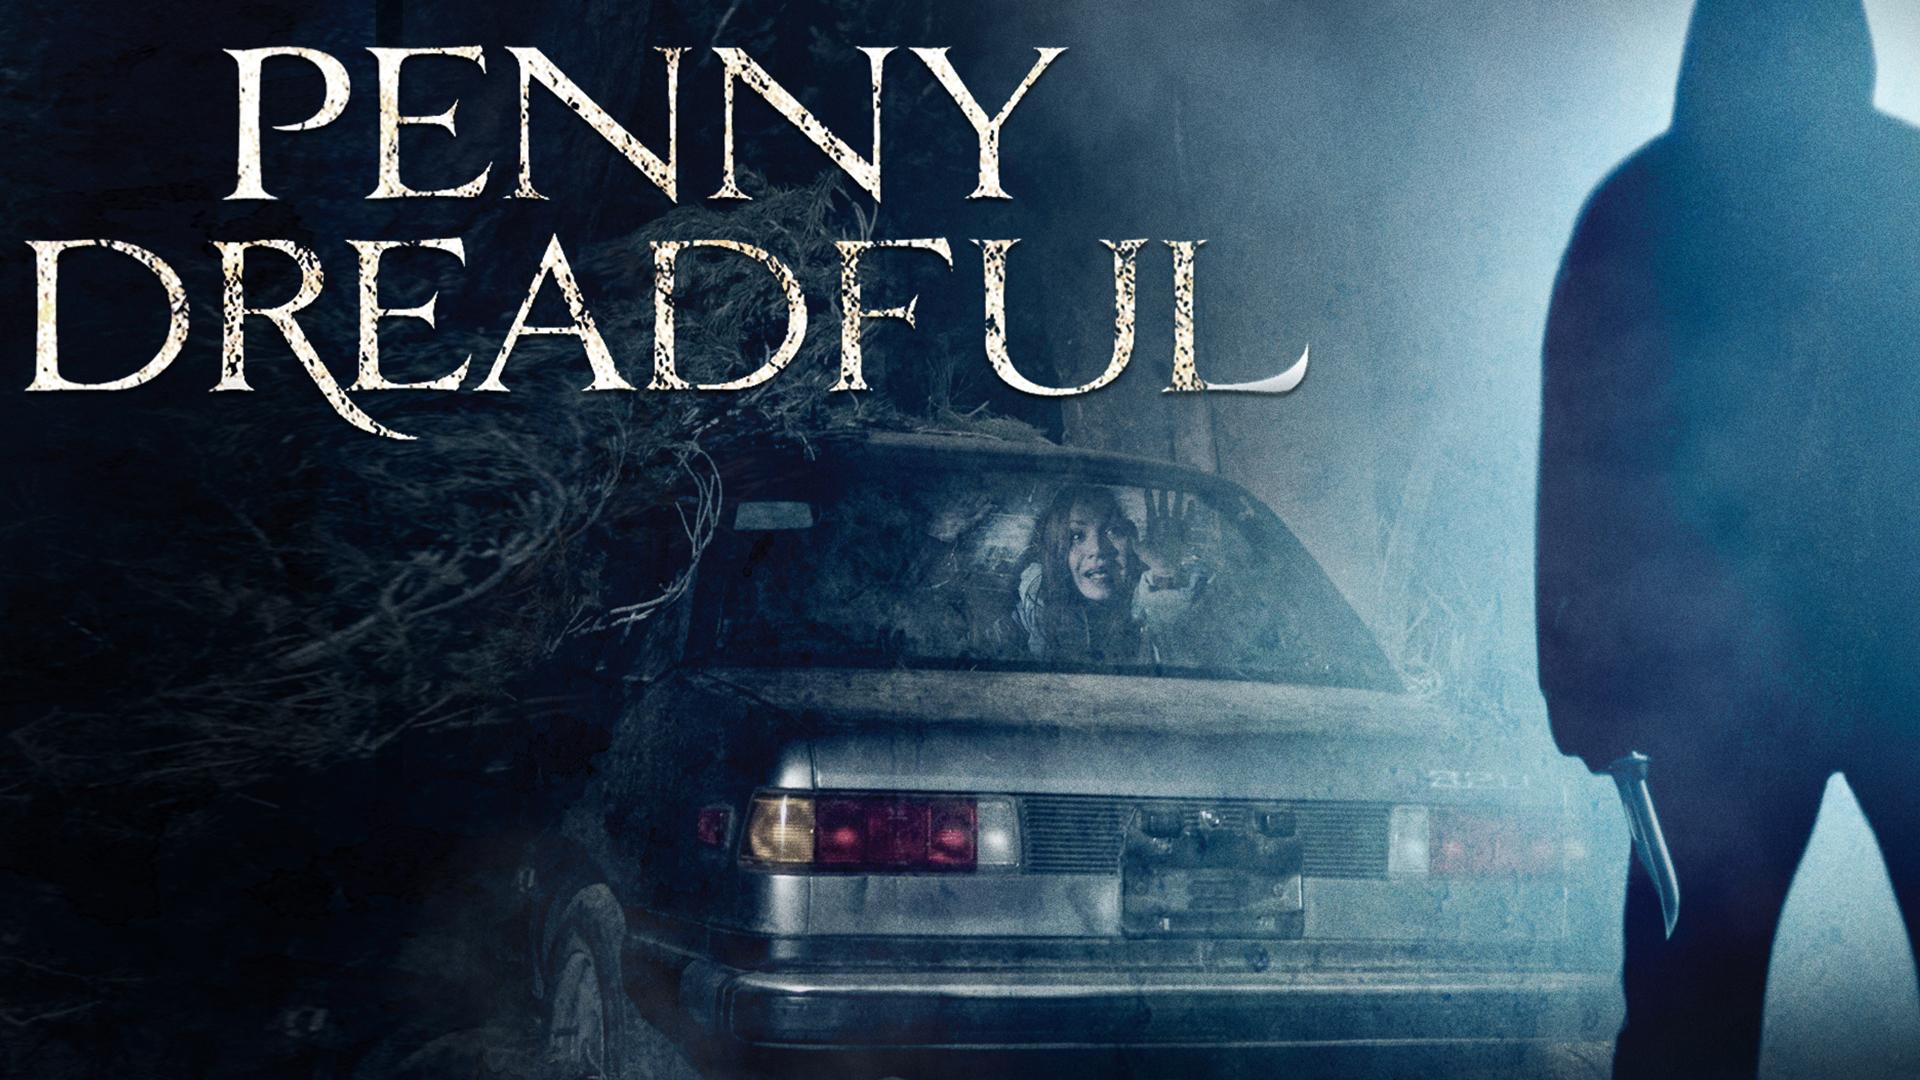 Penny Dreadful - After Dark Horrorfest